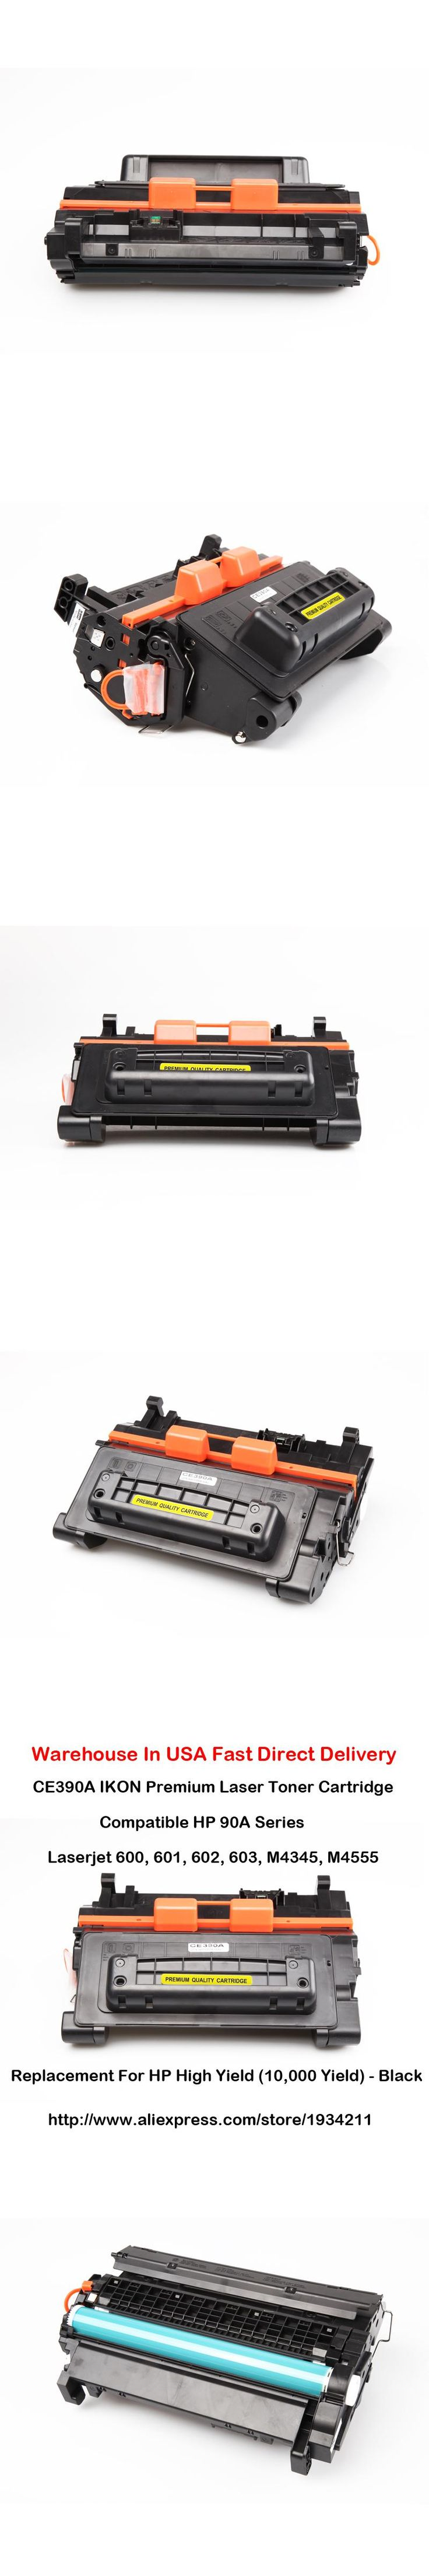 CE390A 90A Series Laser Toner Cartridge patible For HP LaserJet 600 601 602